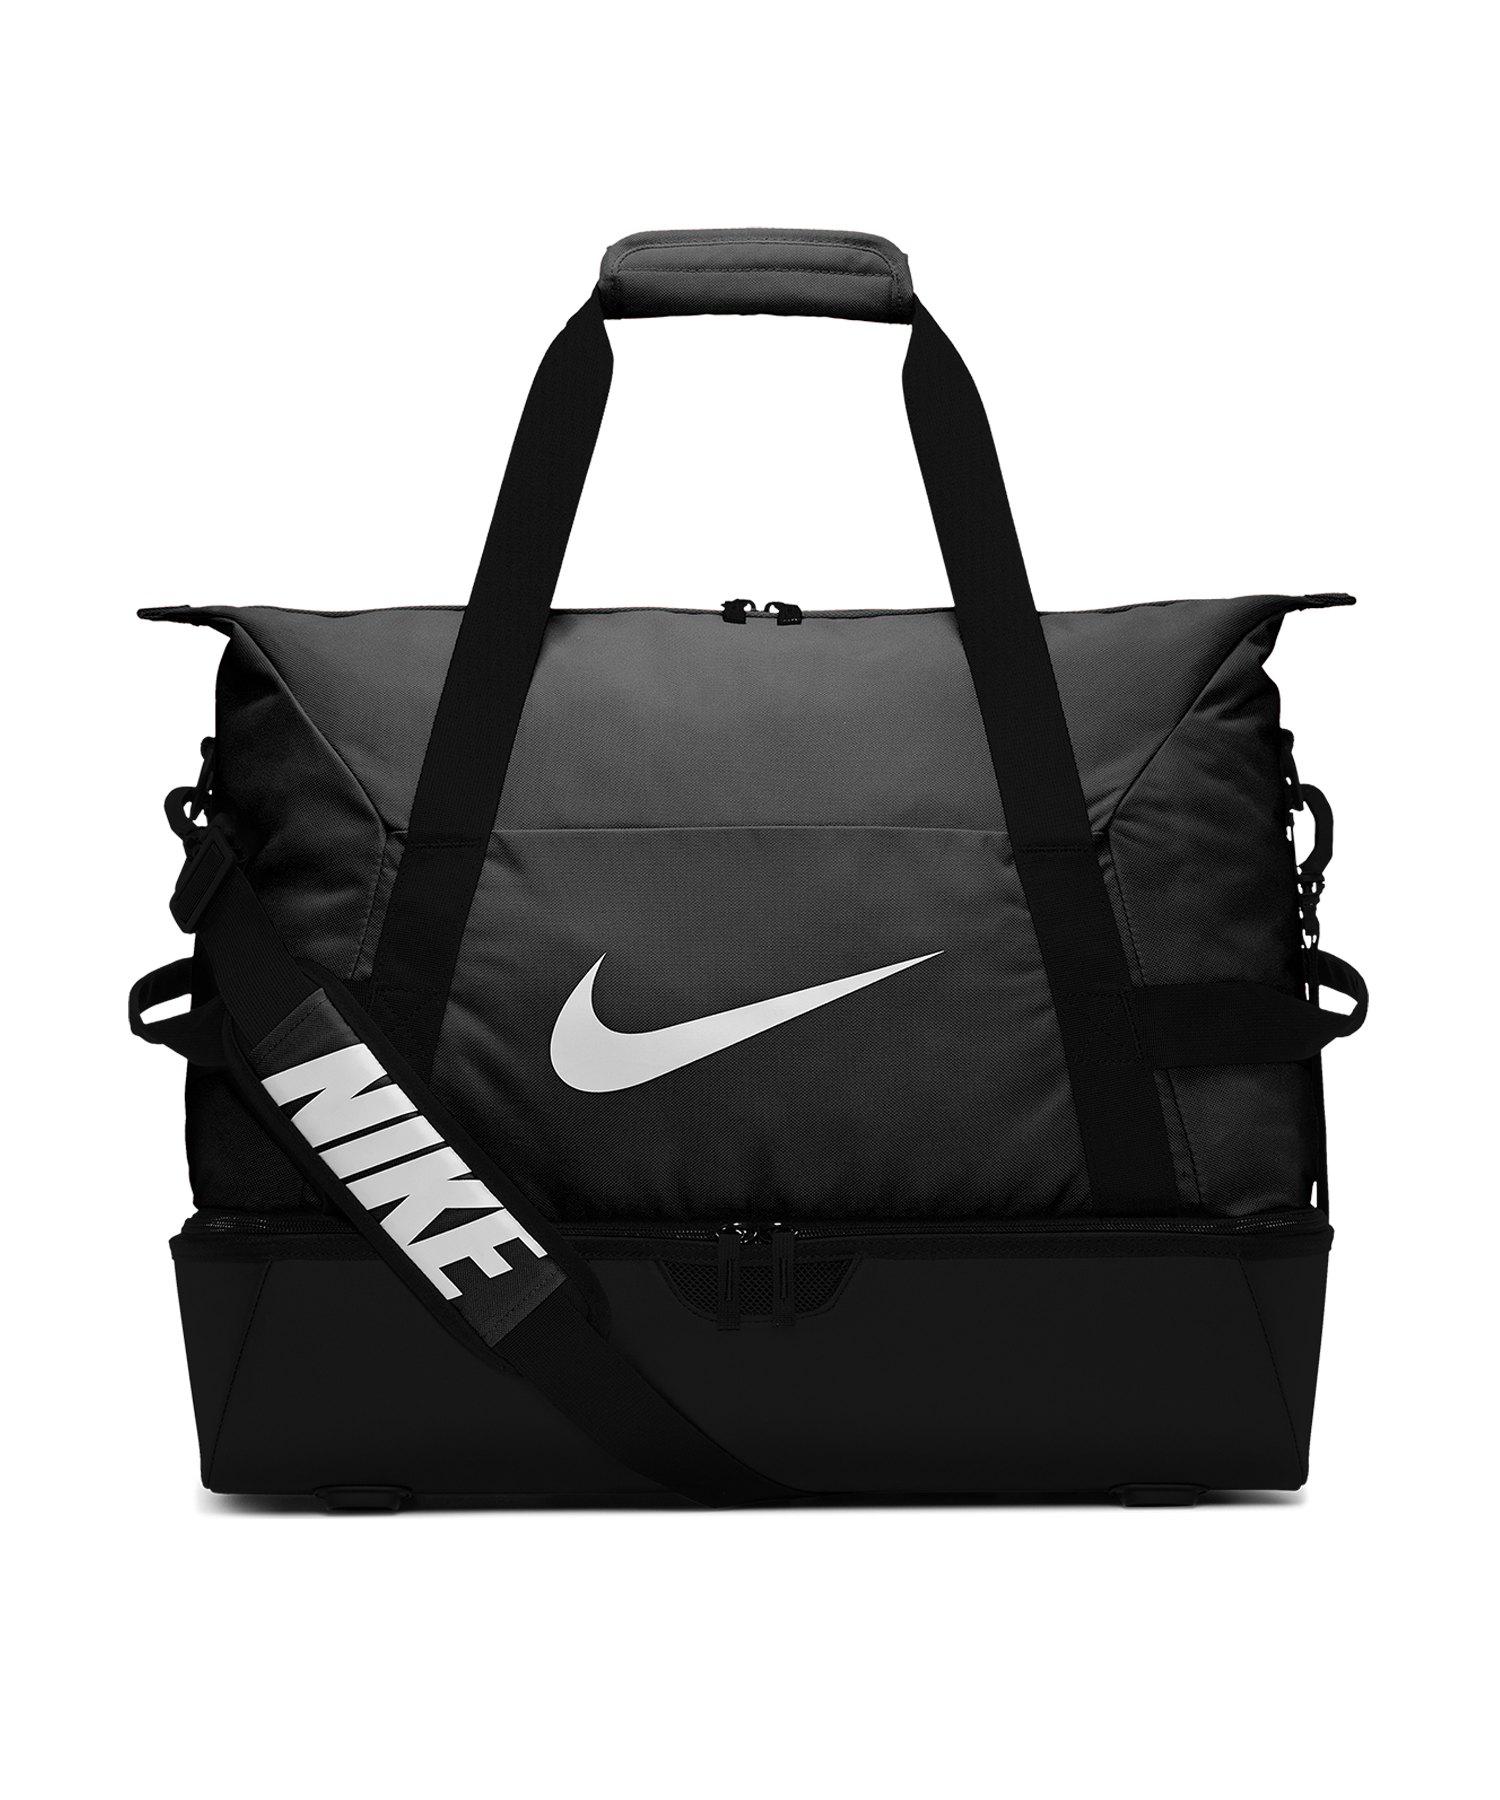 Nike Academy Duffle Tasche Medium F010 - schwarz